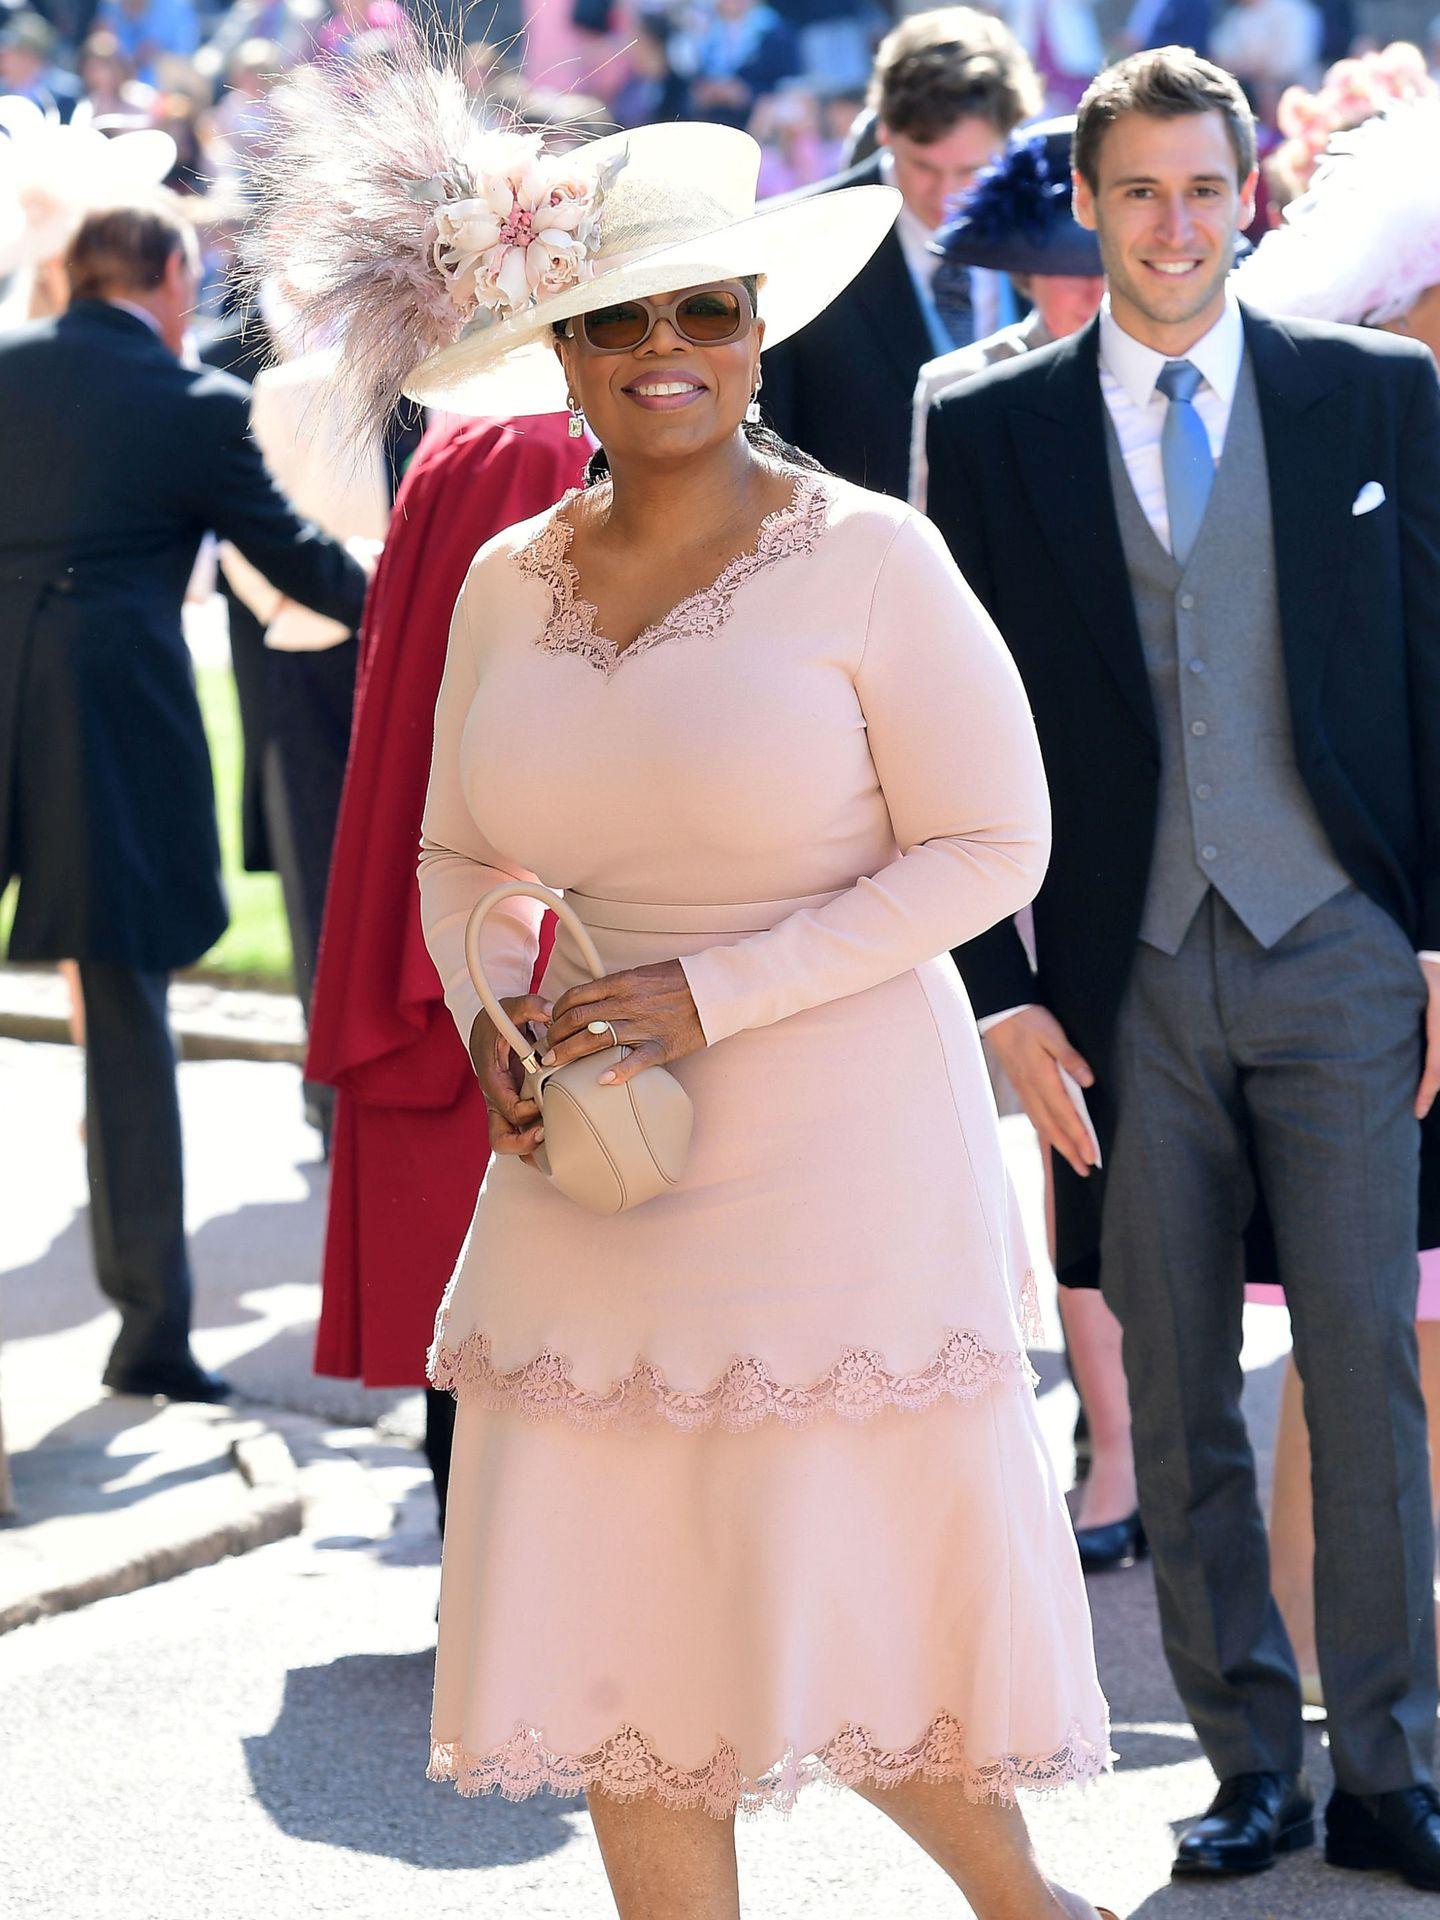 Oprah, en la boda de Harry y Meghan. (Reuters)